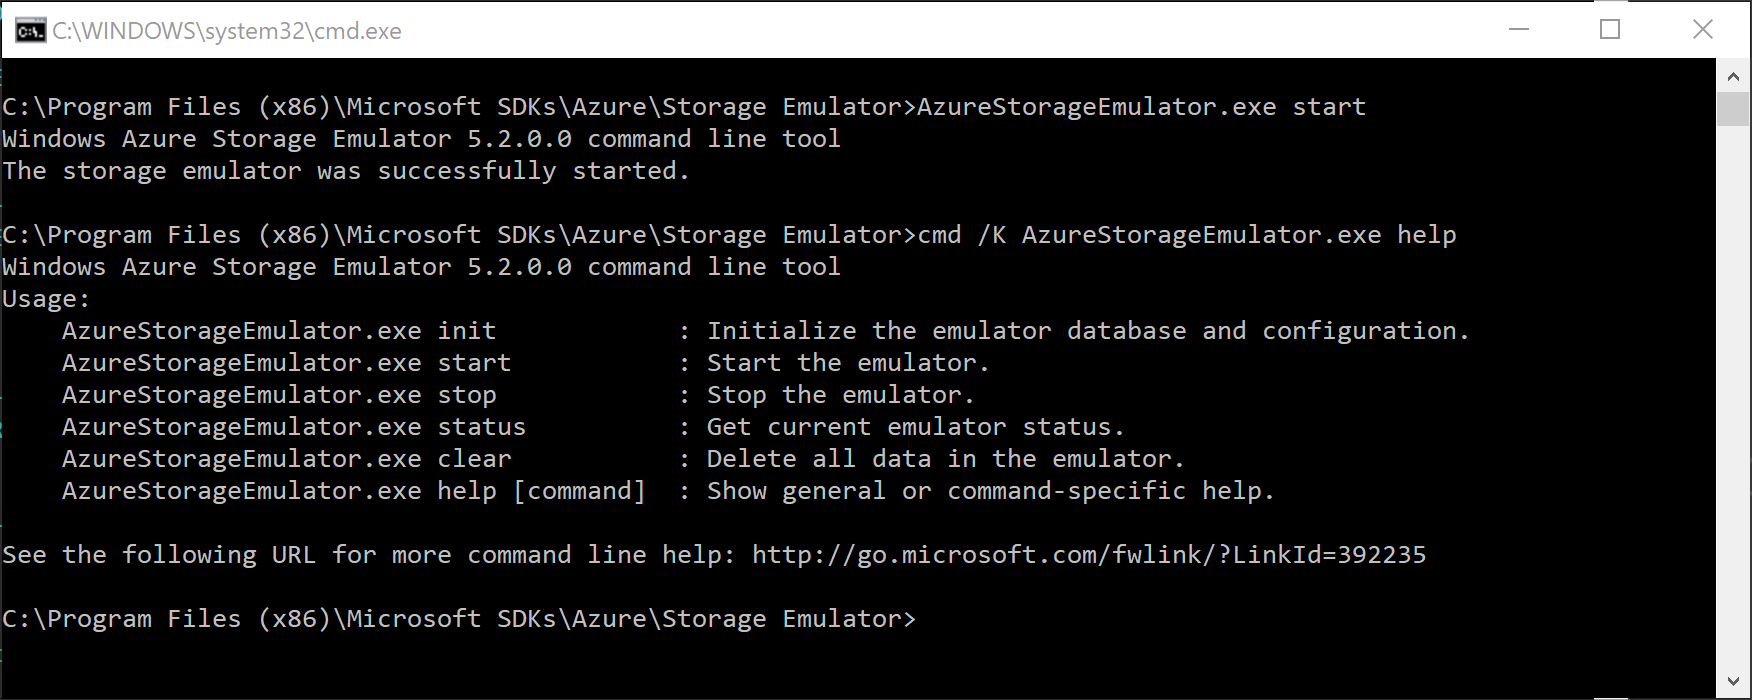 Azure Storage Emulator is started